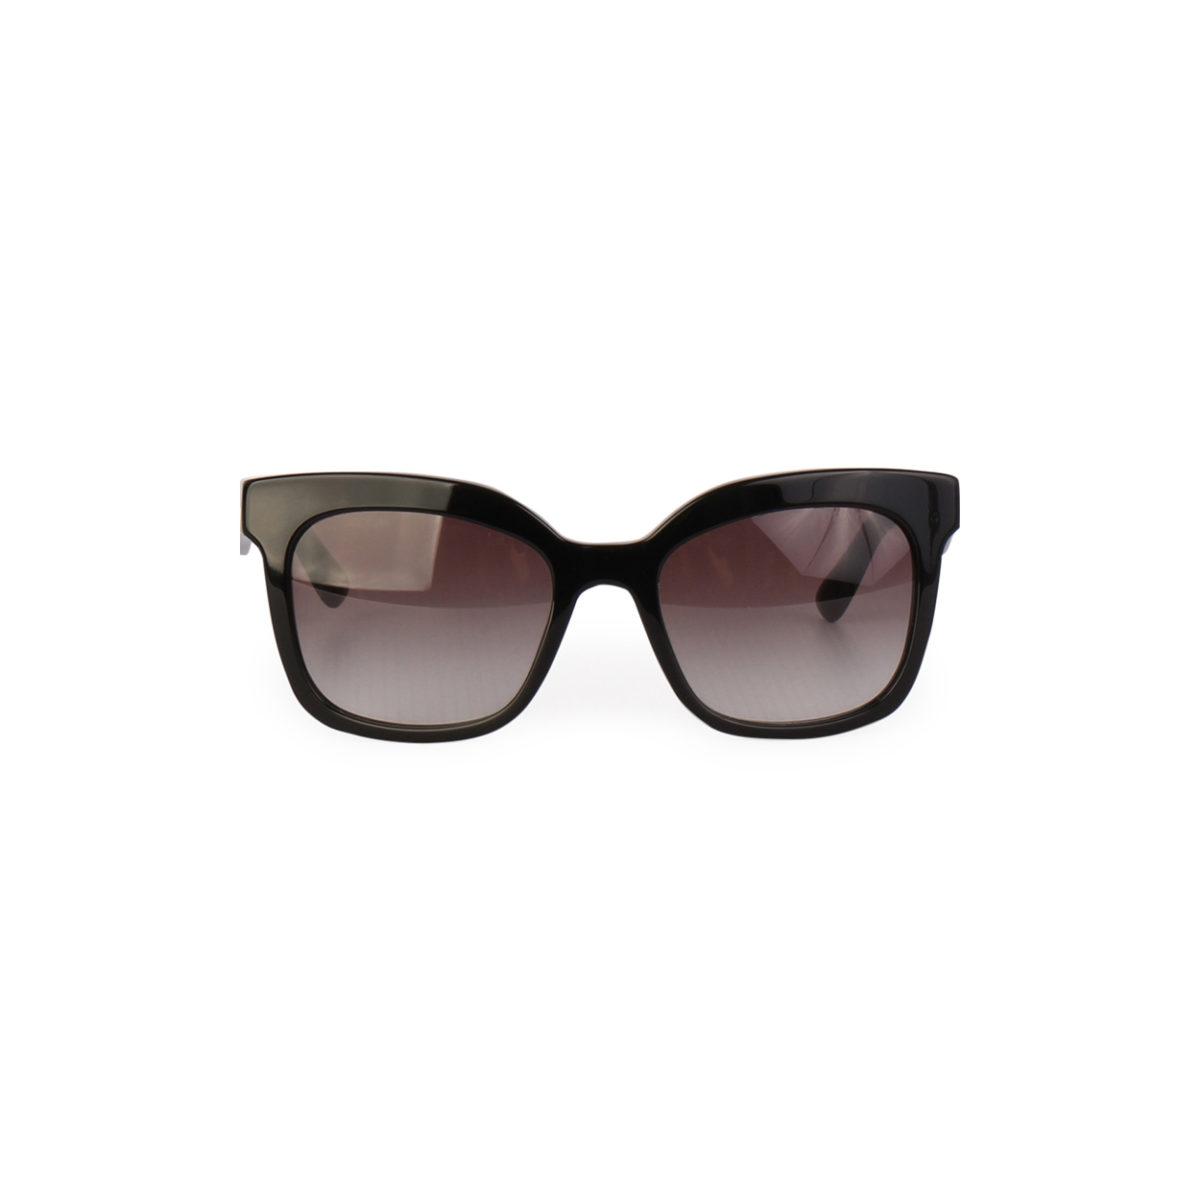 8dc9fa80b493 Prada Sunglasses Cat Eye